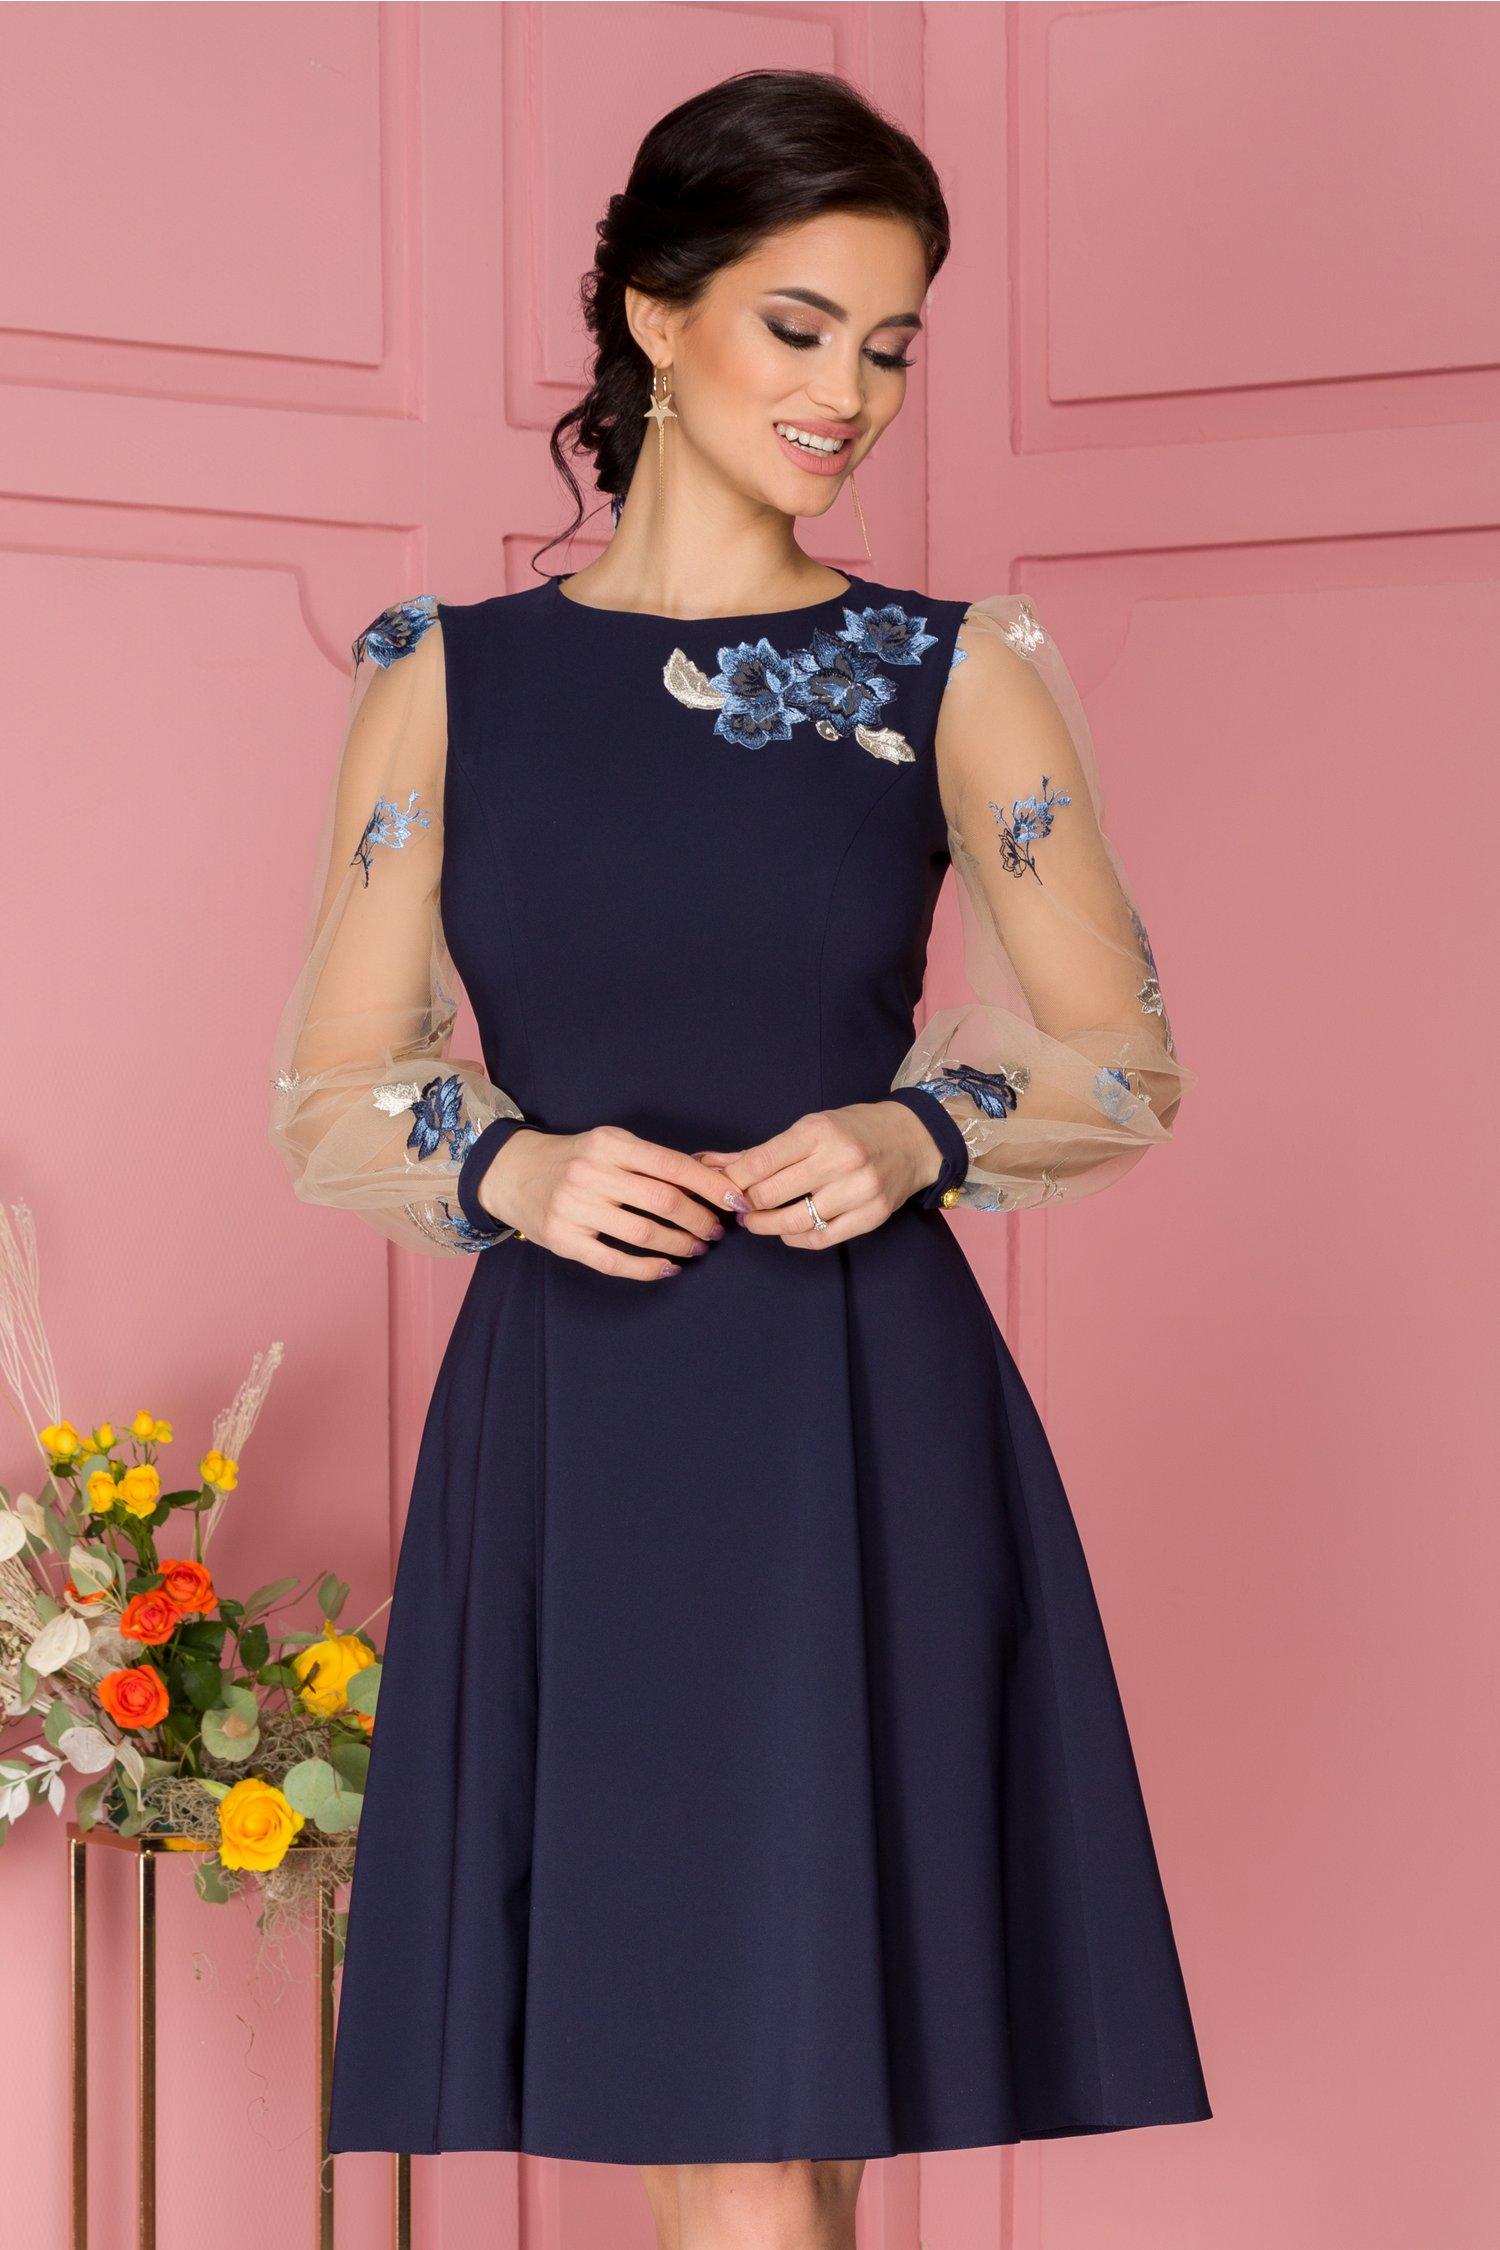 Rochie LaDonna bleumarin cu maneci din tull si broderie florala